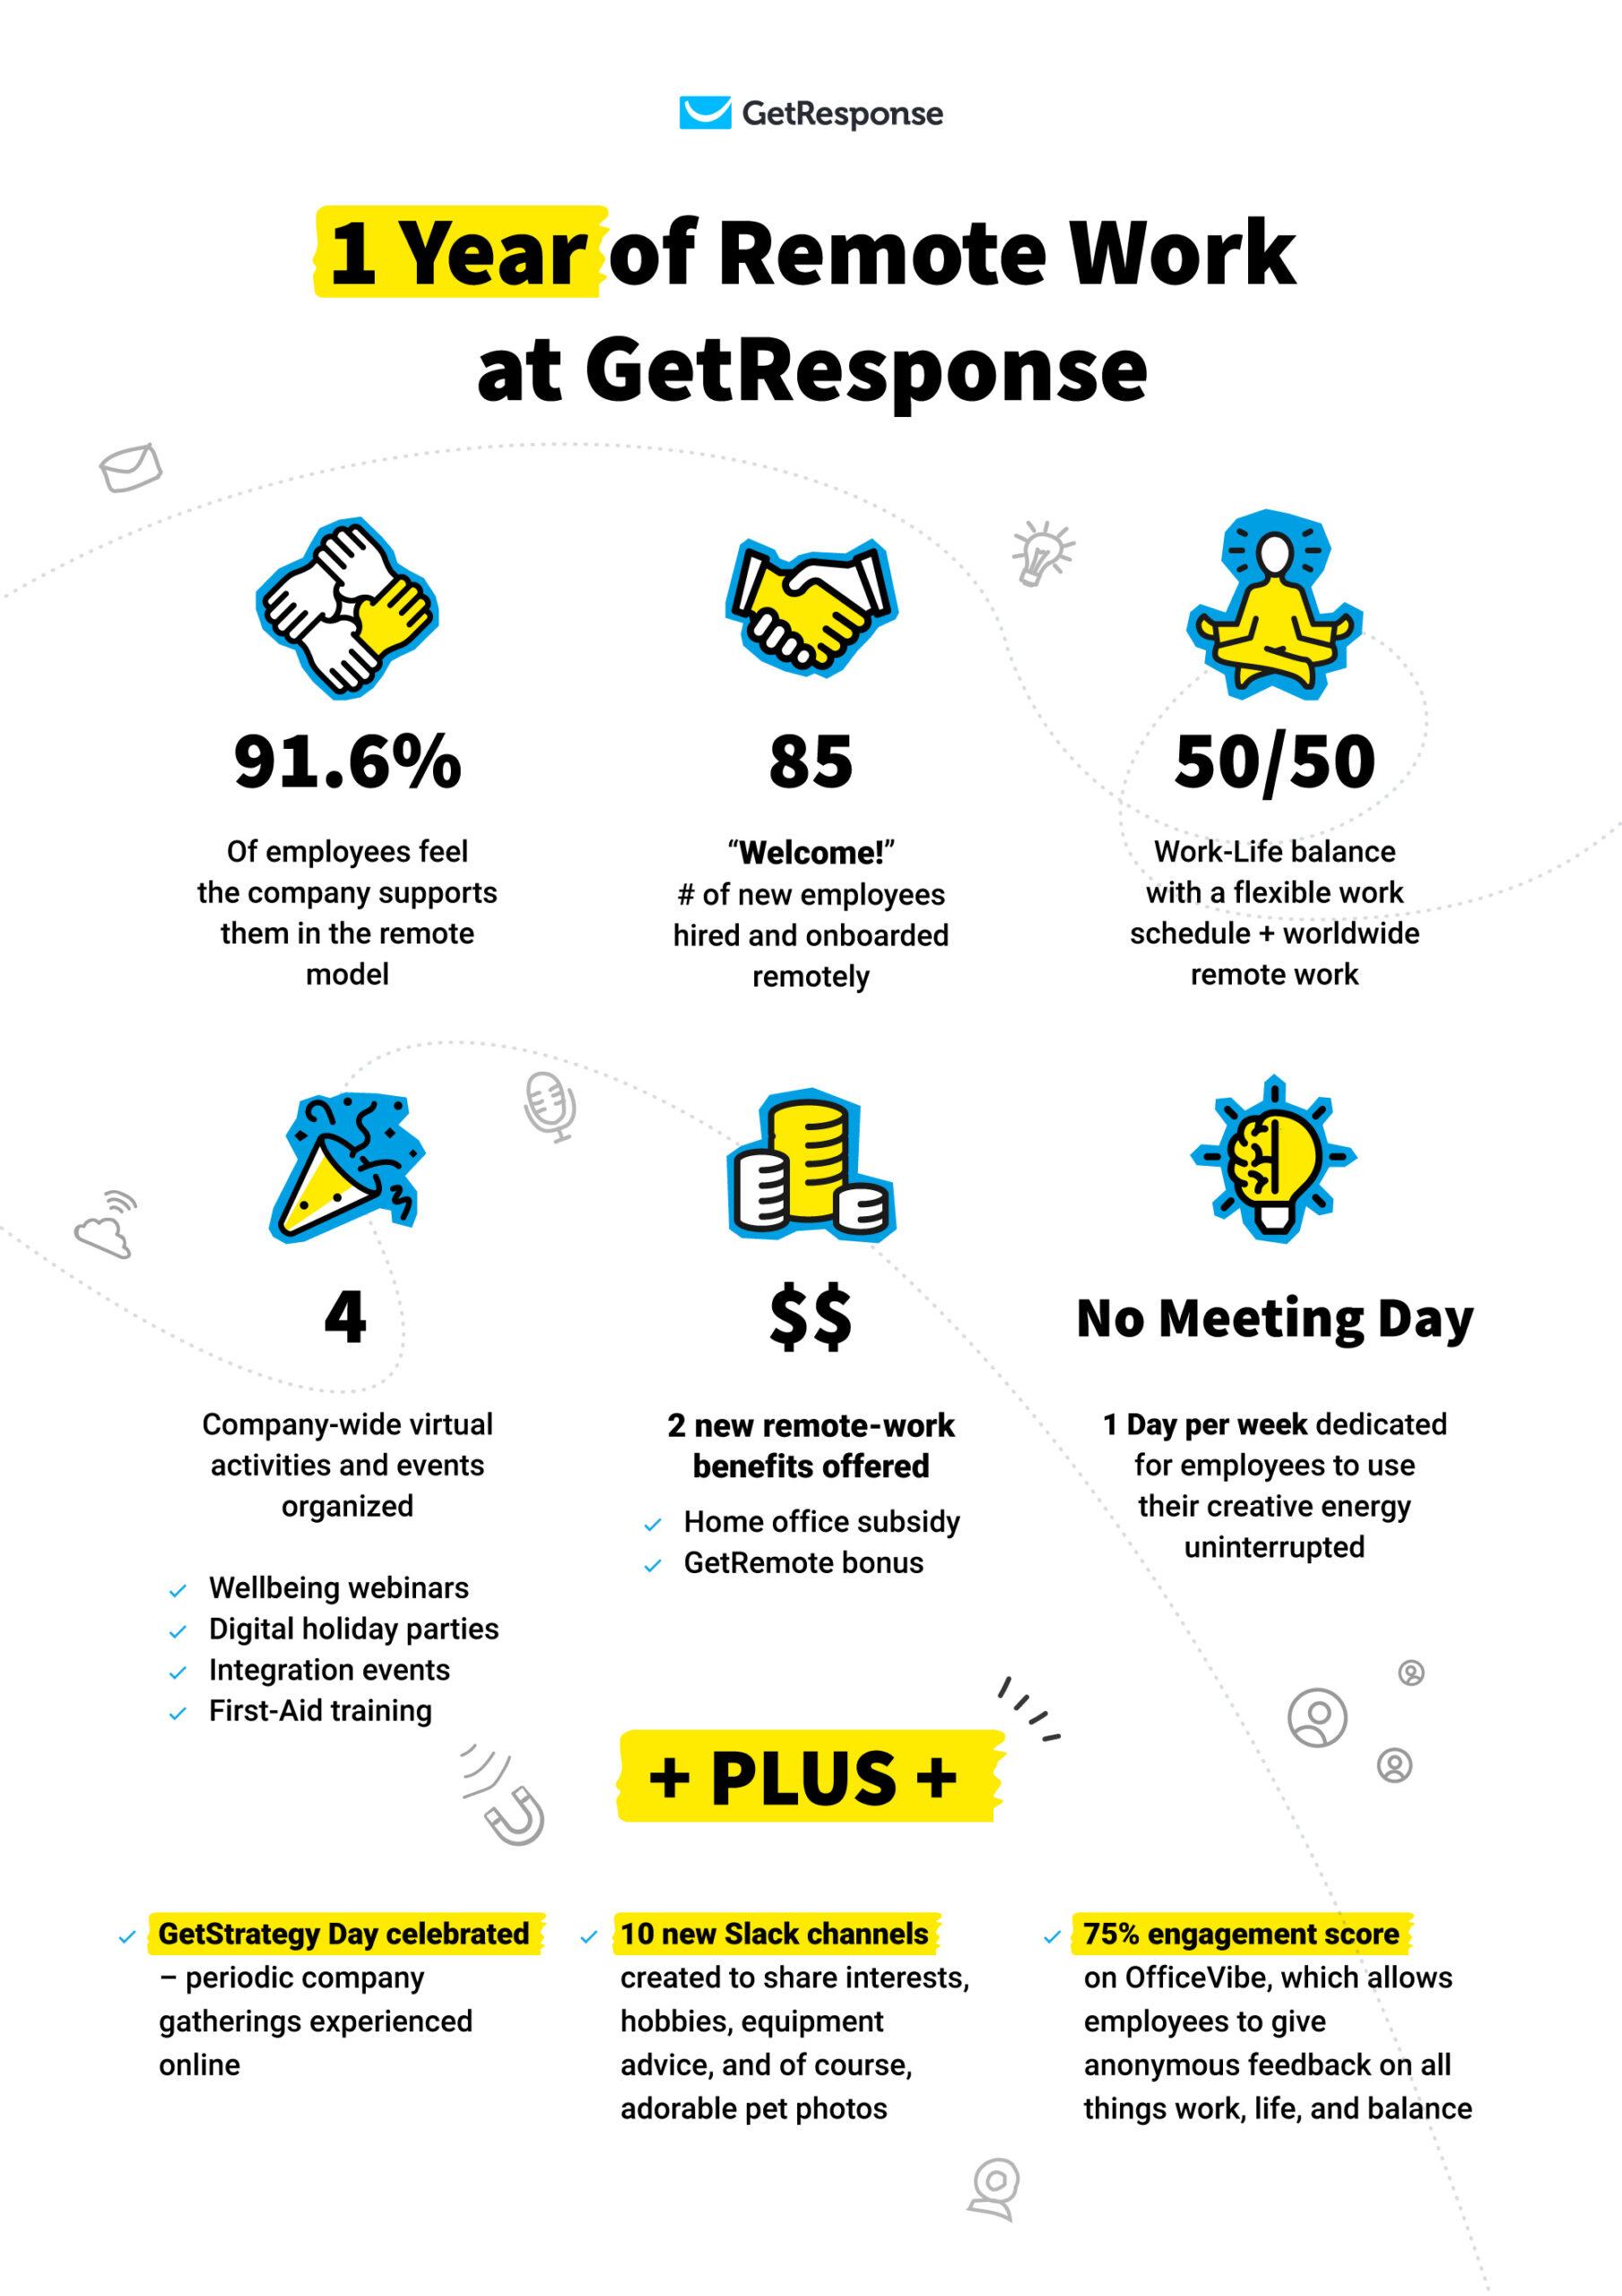 One year of remote work at GetResponse statistics.